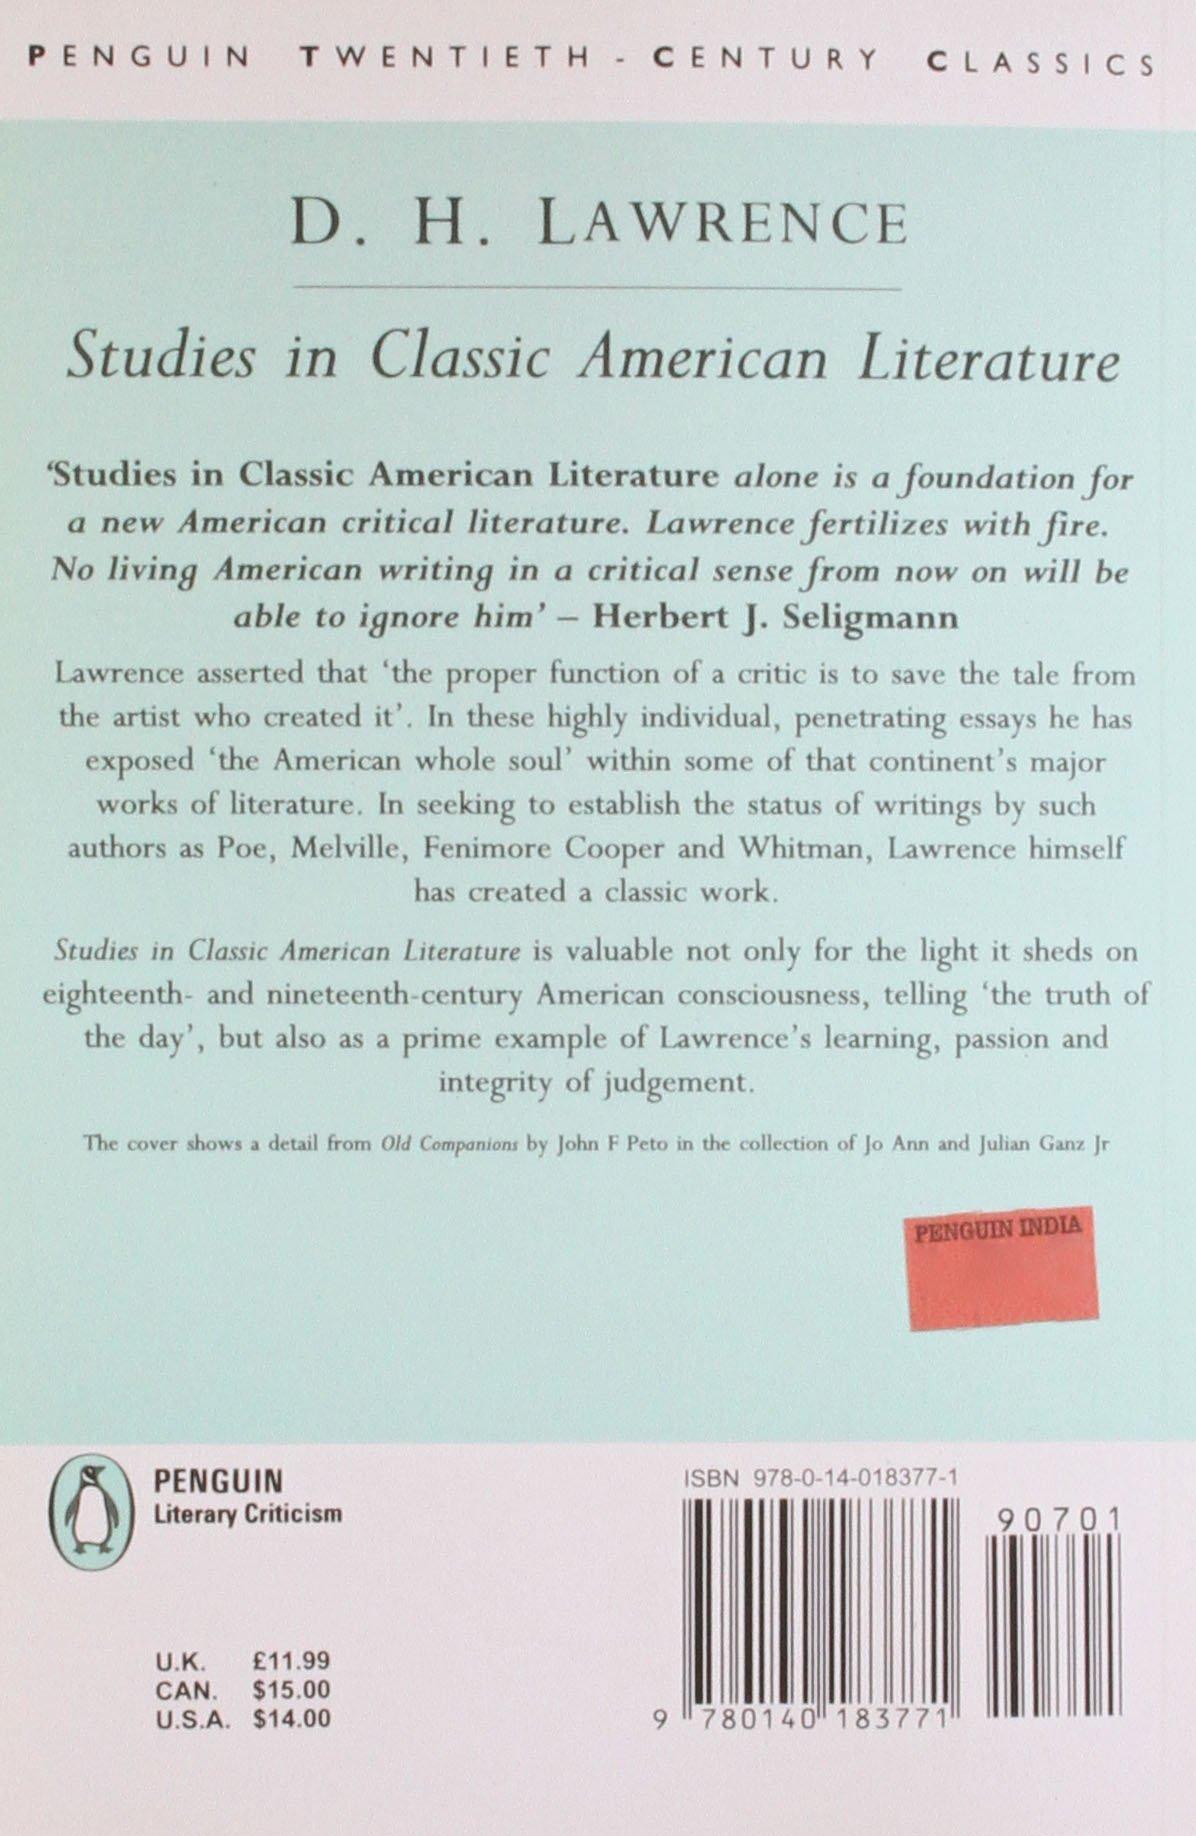 com studies in classic american literature classic th com studies in classic american literature classic 20th century penguin 9780140183771 d h lawrence books